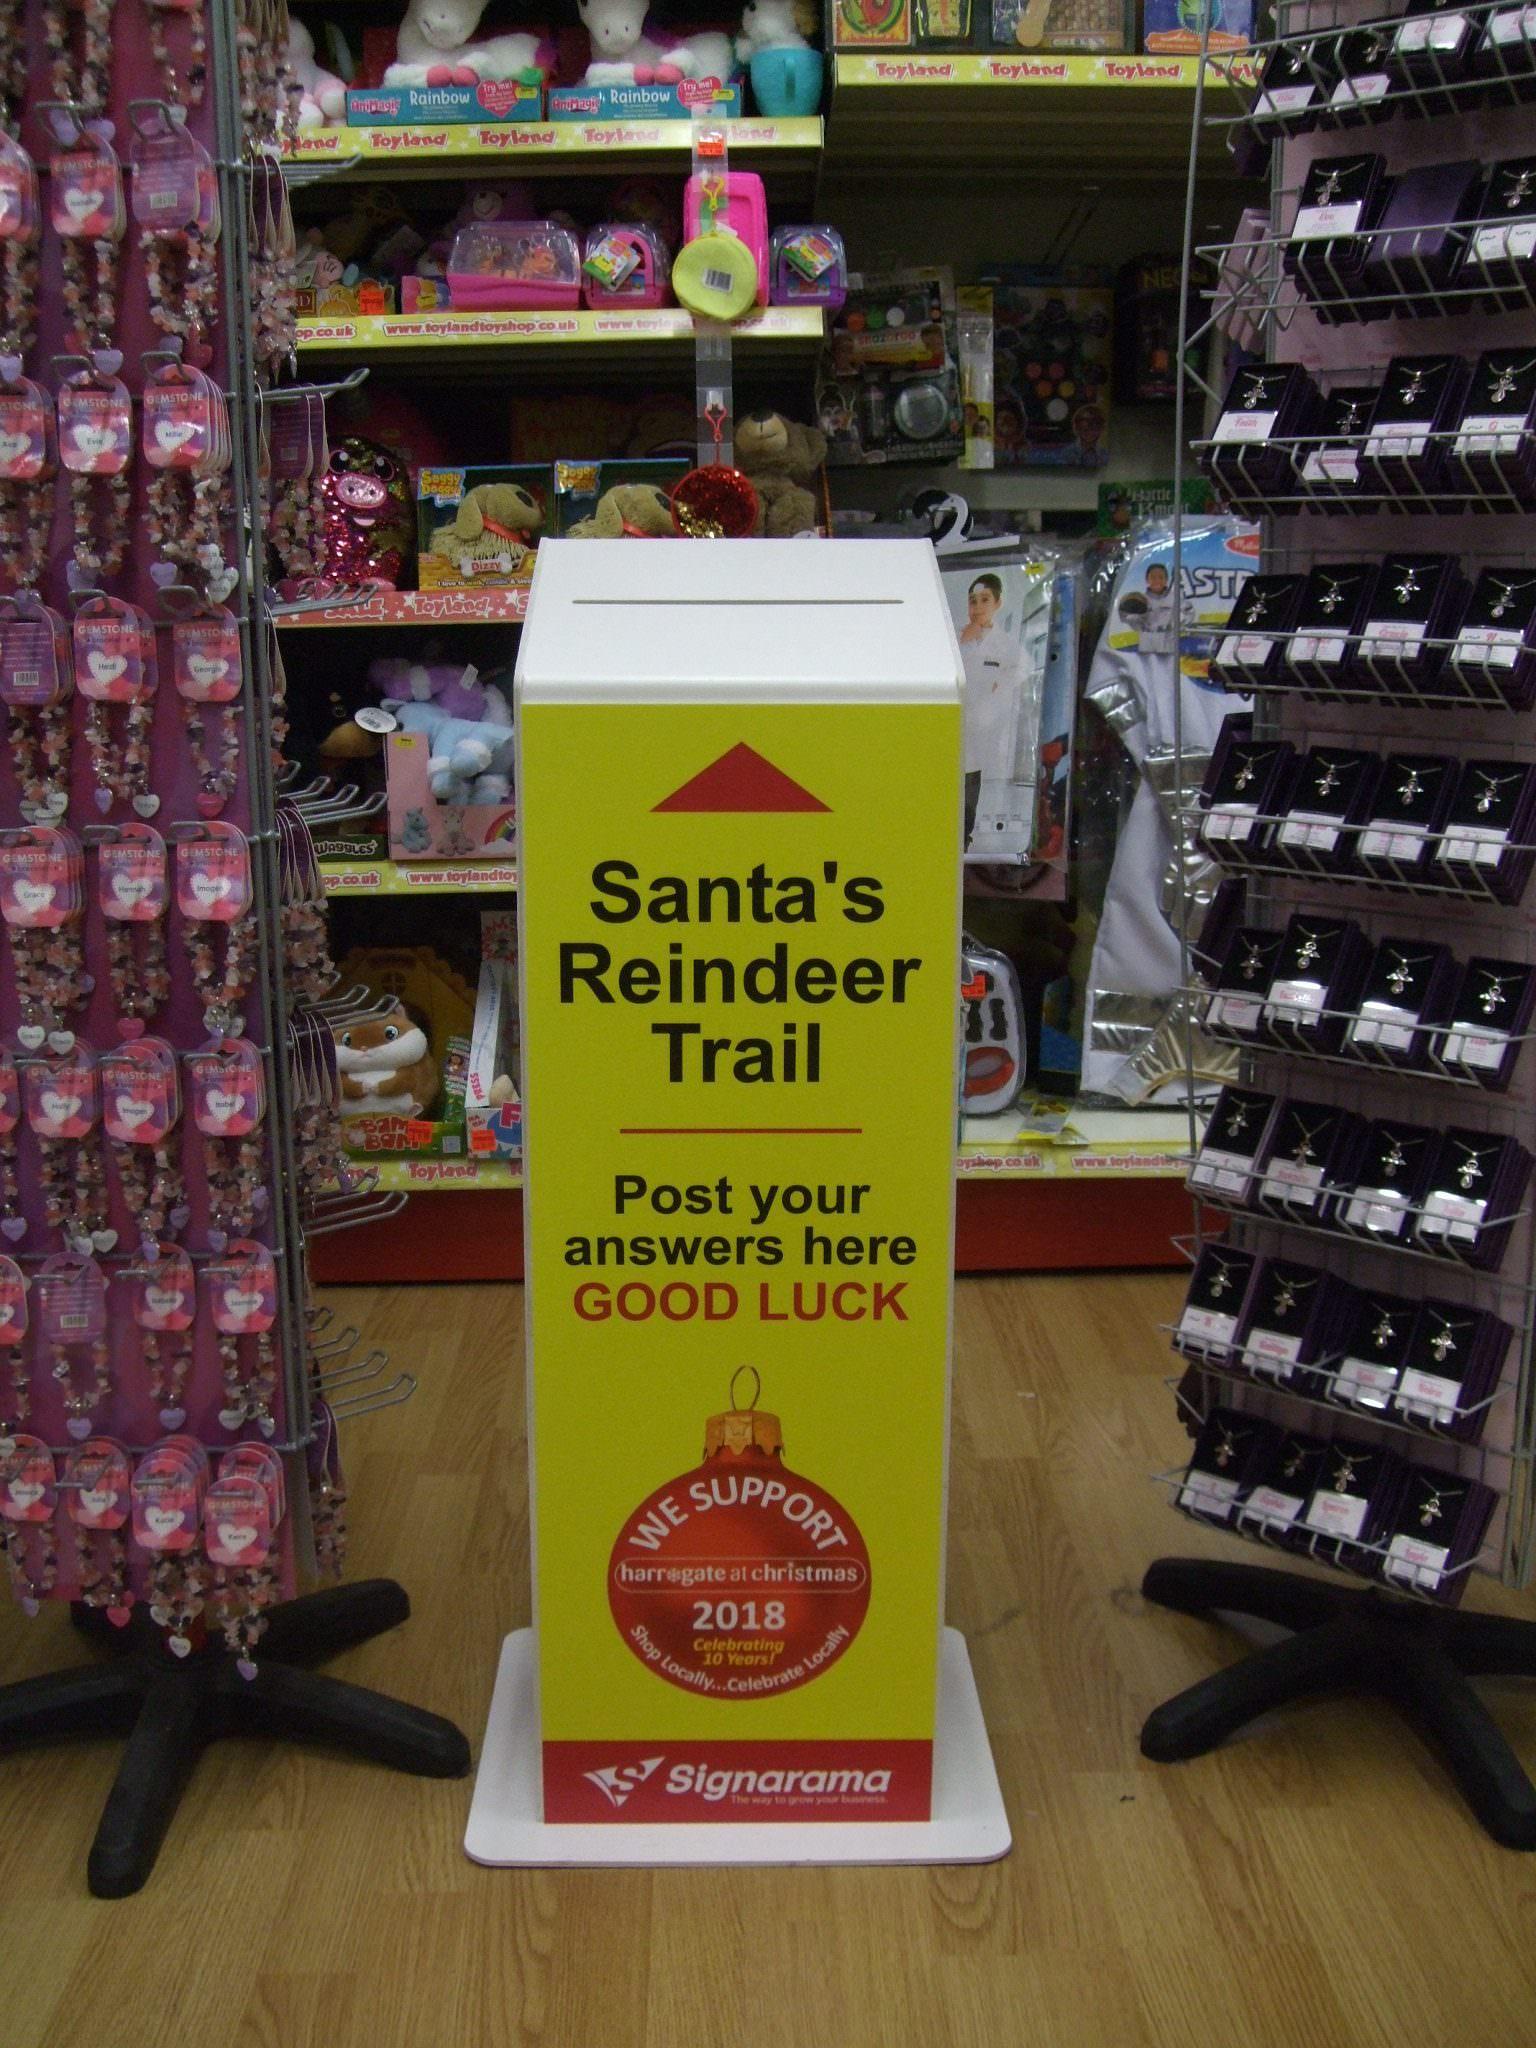 Santa's Reindeer Trail with Harrogate at Christmas